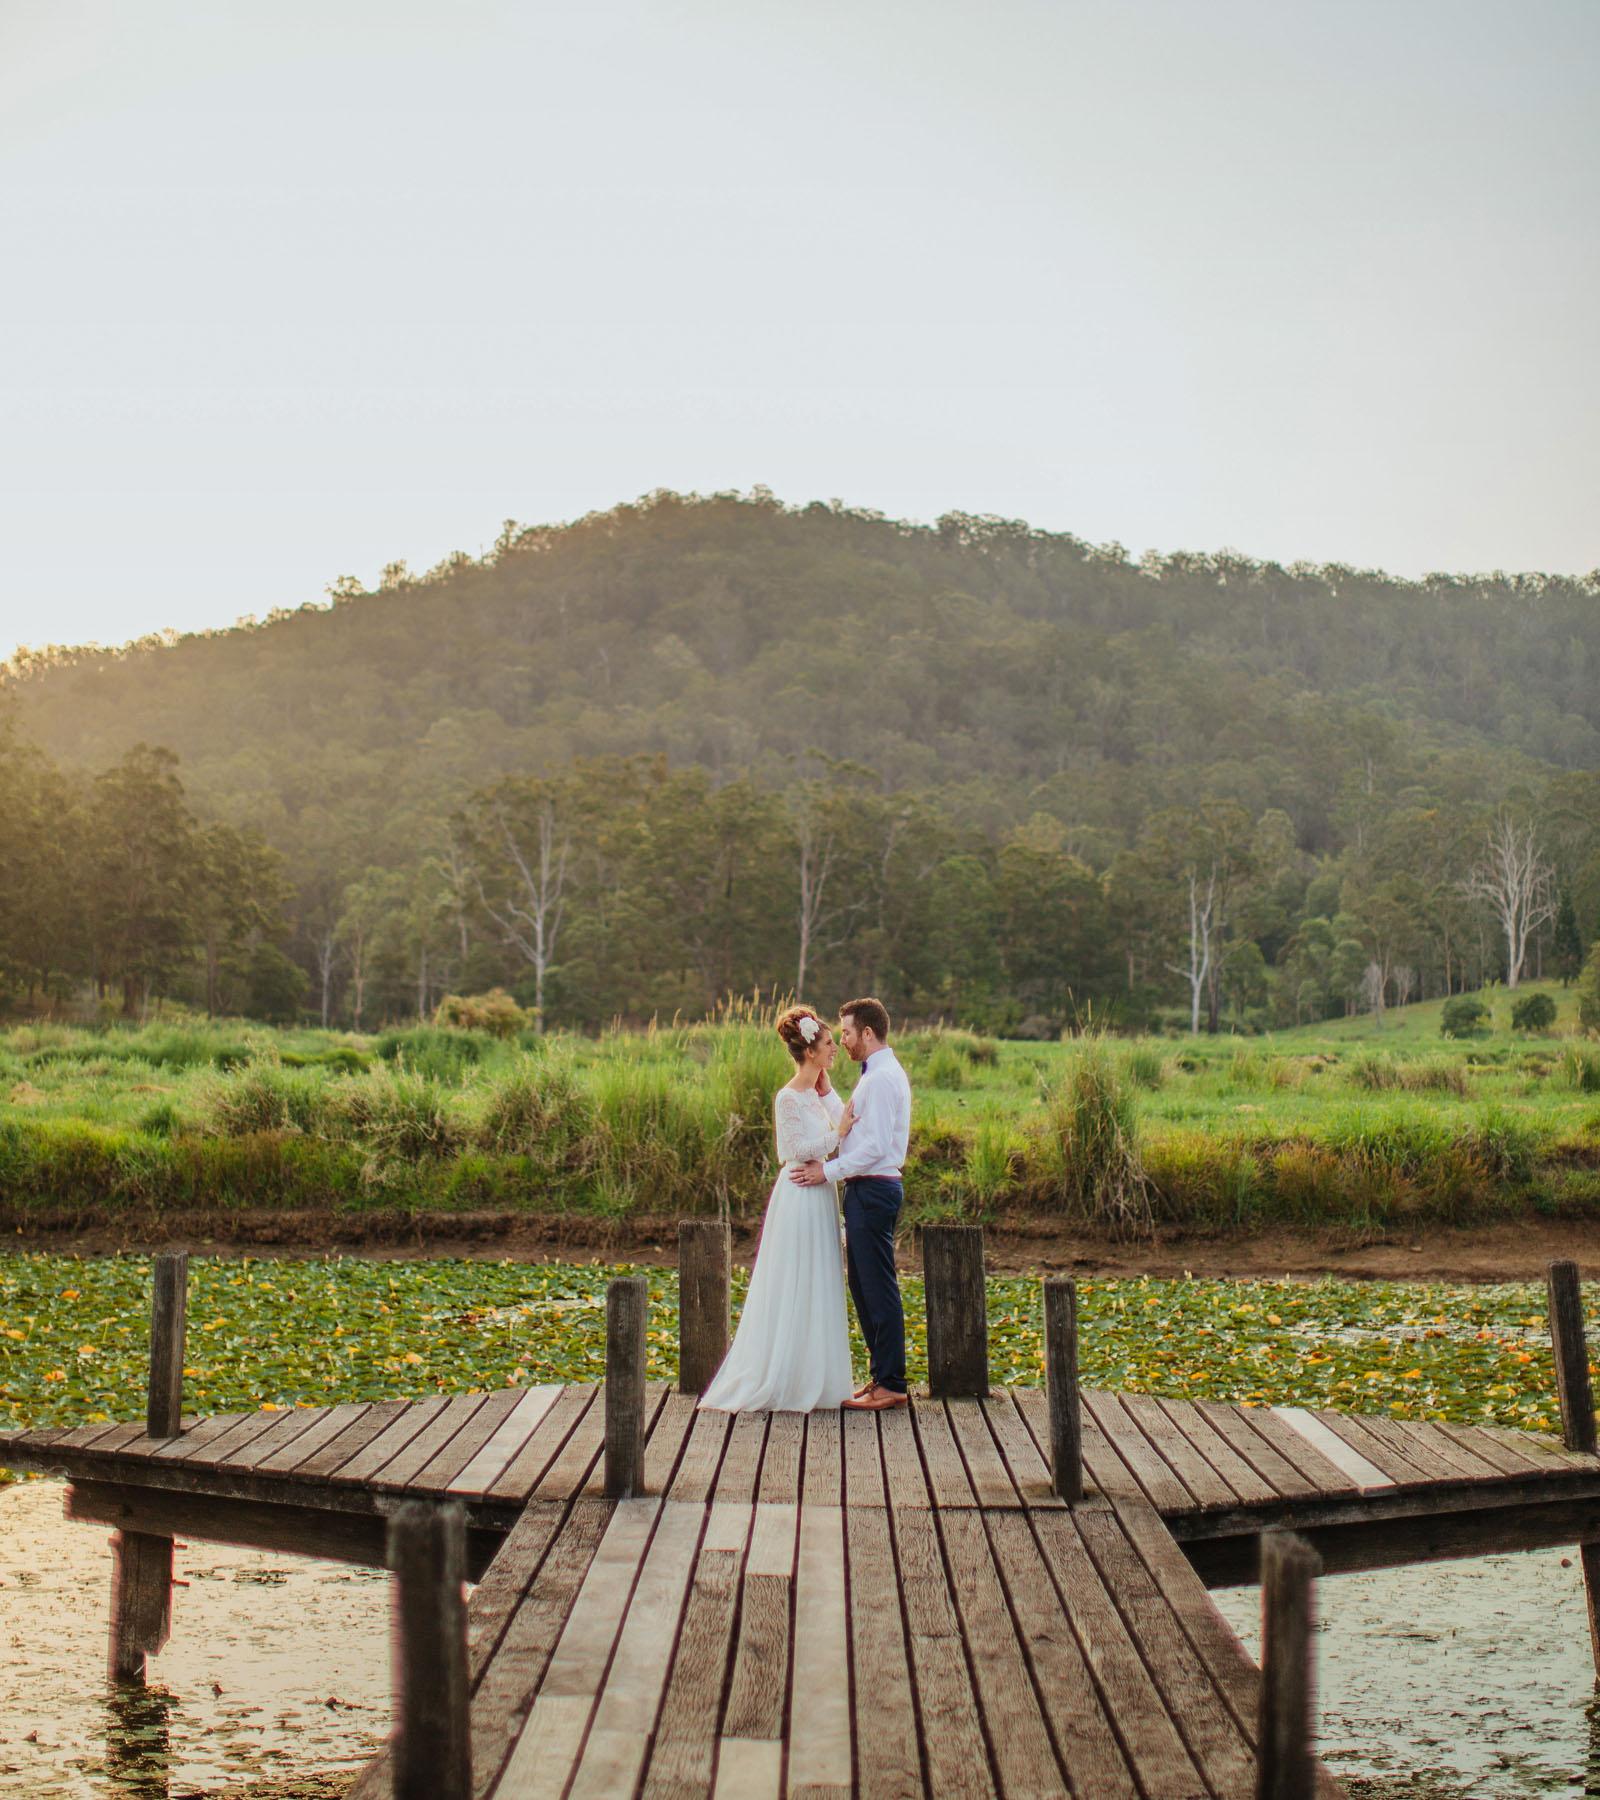 23_midginbill hill wedding .jpg